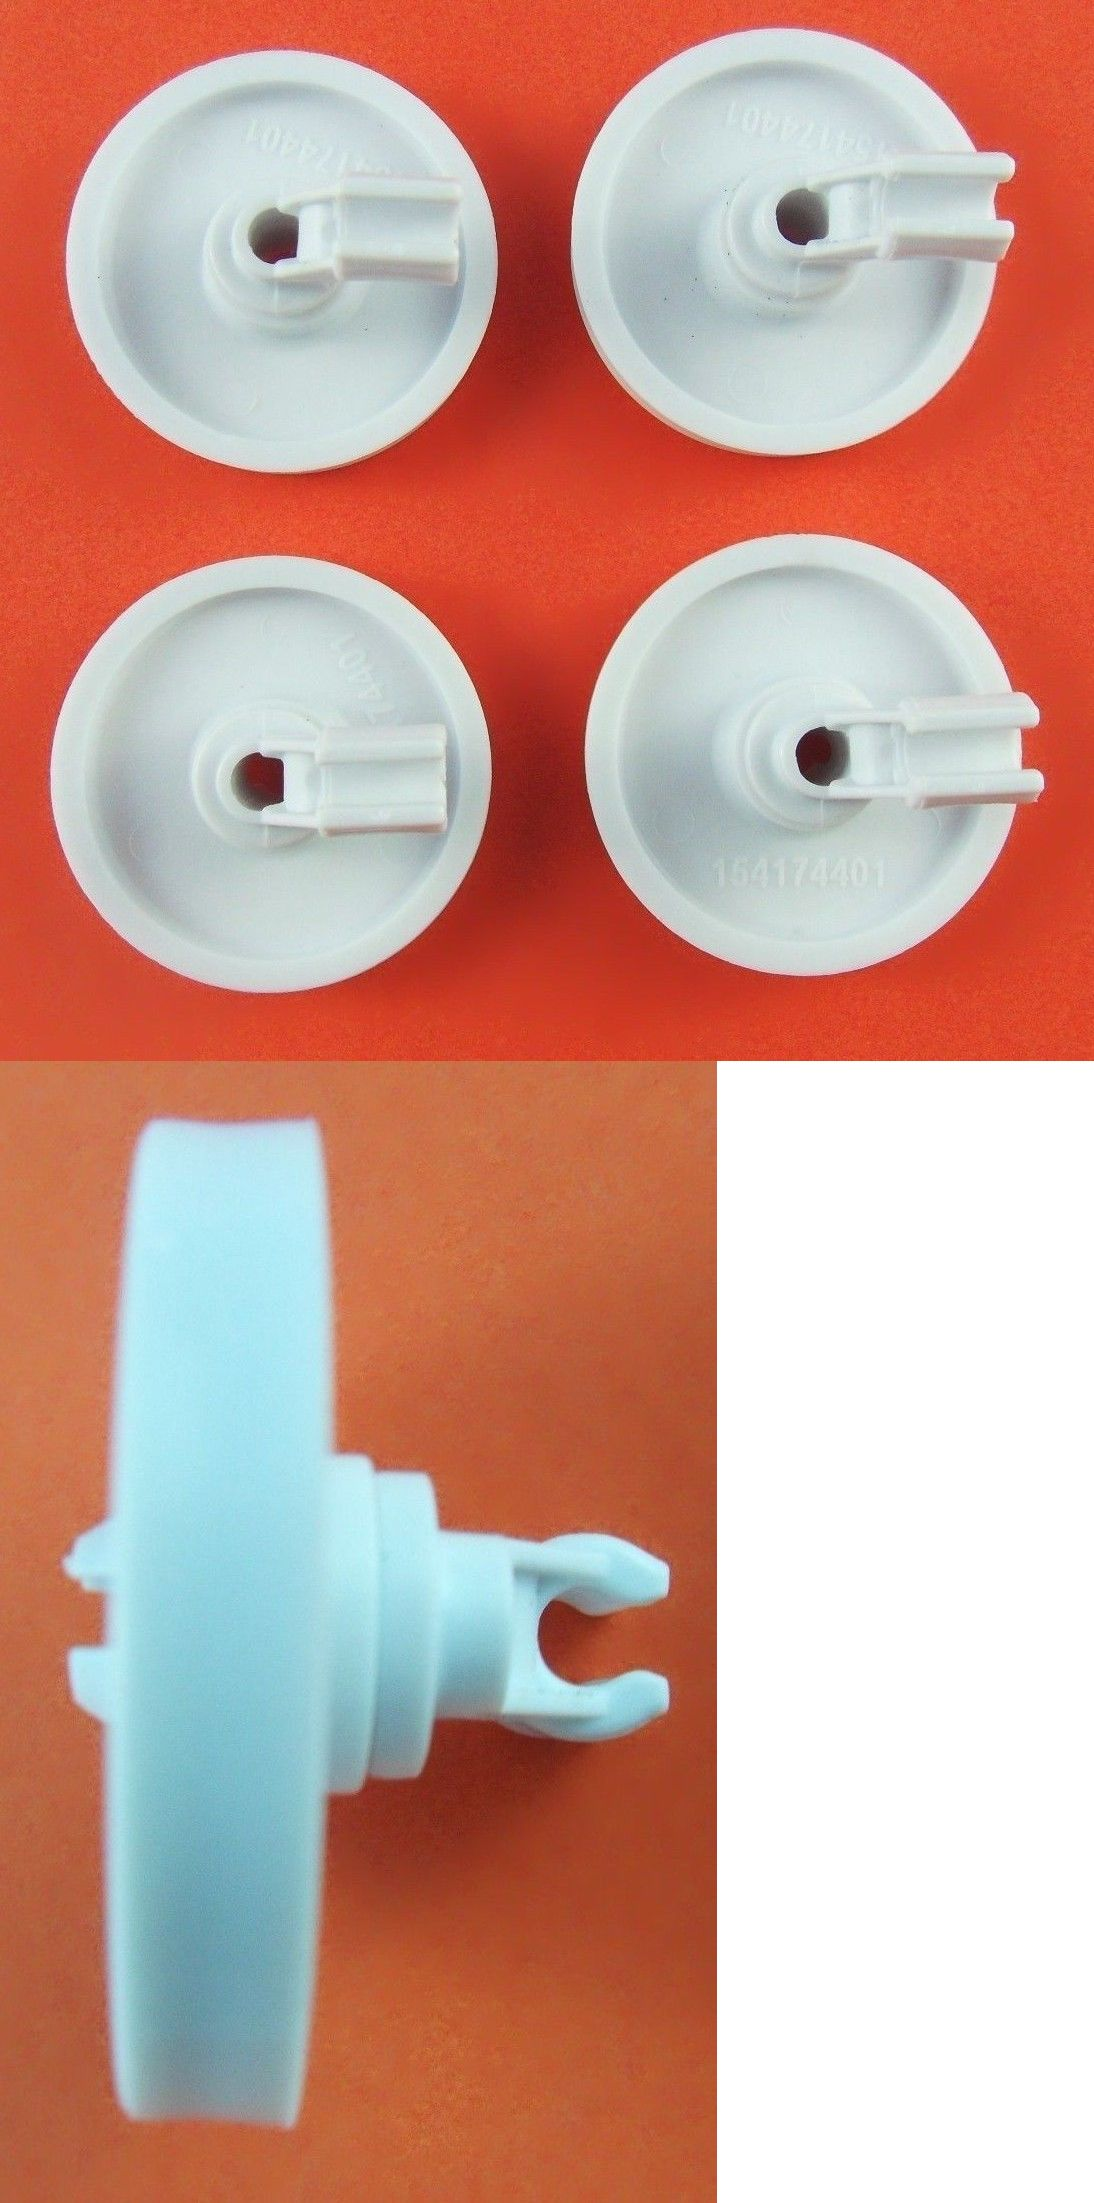 Details About Frigidaire Dishwasher Lower Wheel Part 154174401